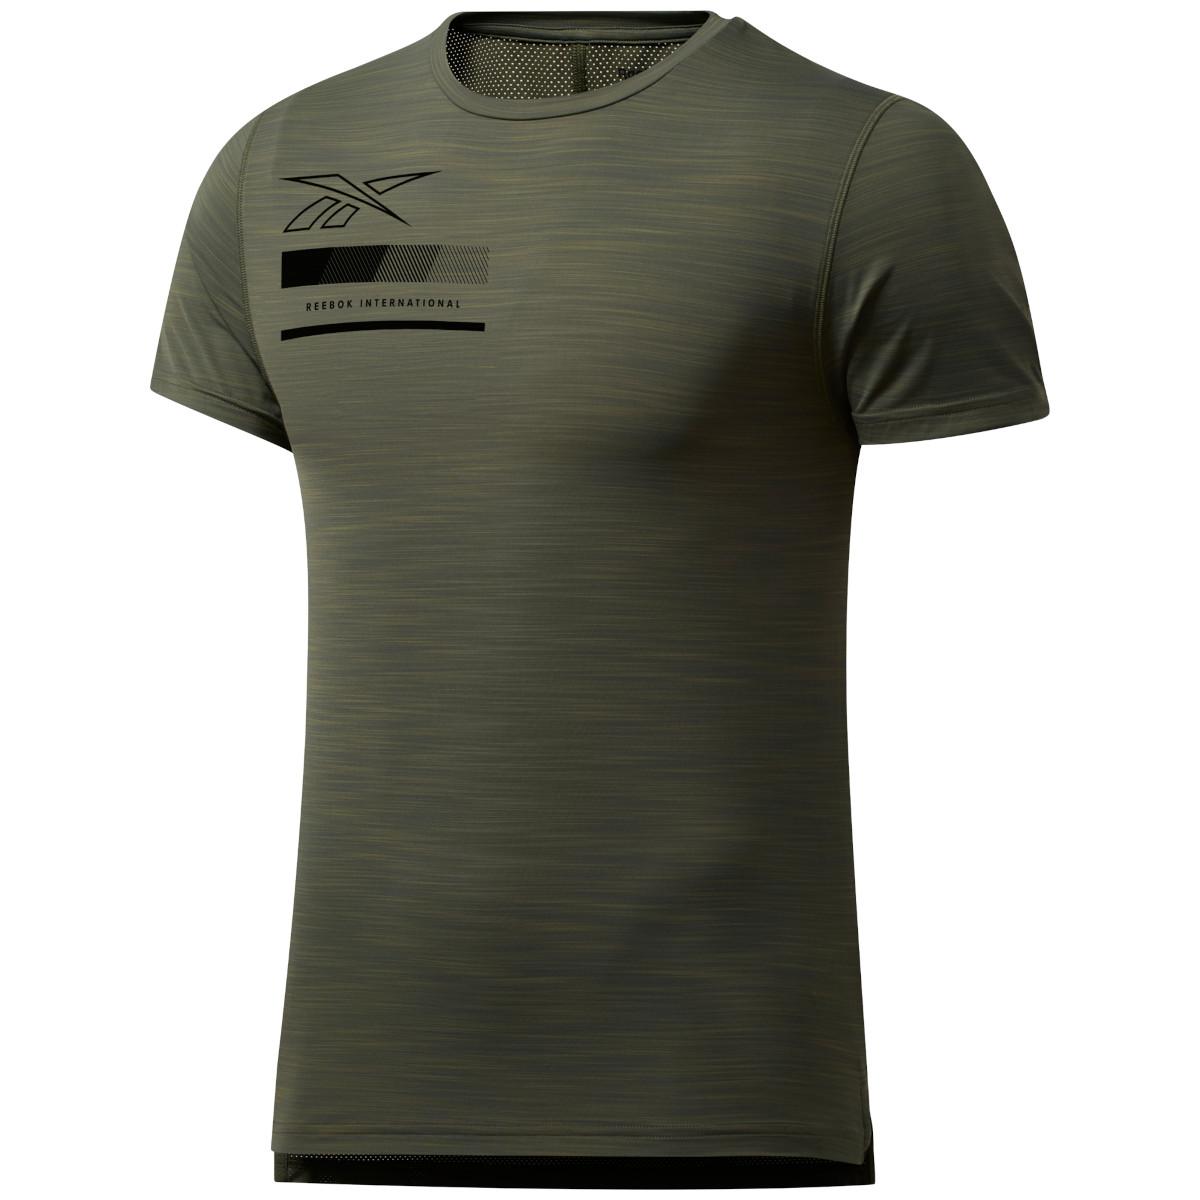 Reebok Männer Activchill Graphic Move T-Shirt - poplar green FU2882